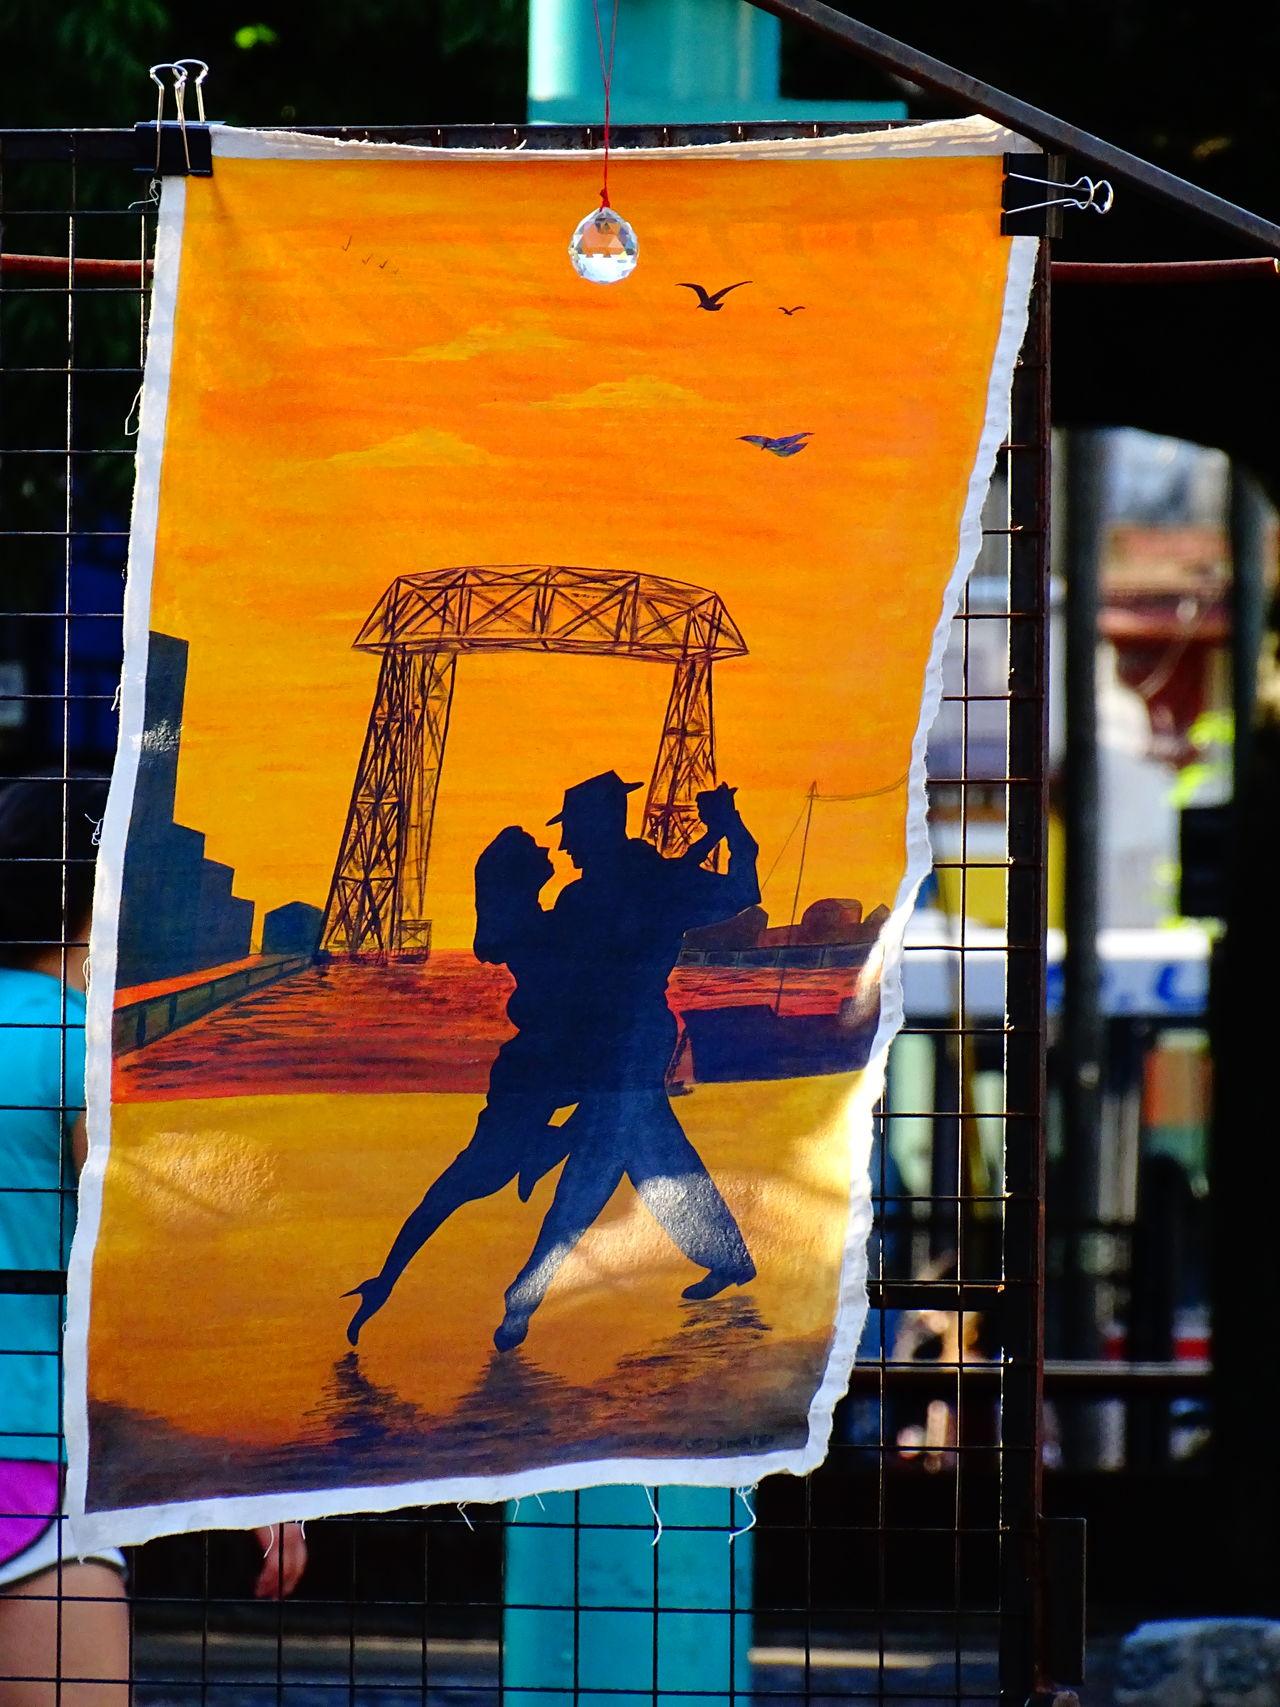 Dancing Tango Argentina Buenos Aires Dancing Tango Full Length Painting Art Street Art In Buenos Aire Street Photography Sunset Tango Dancers